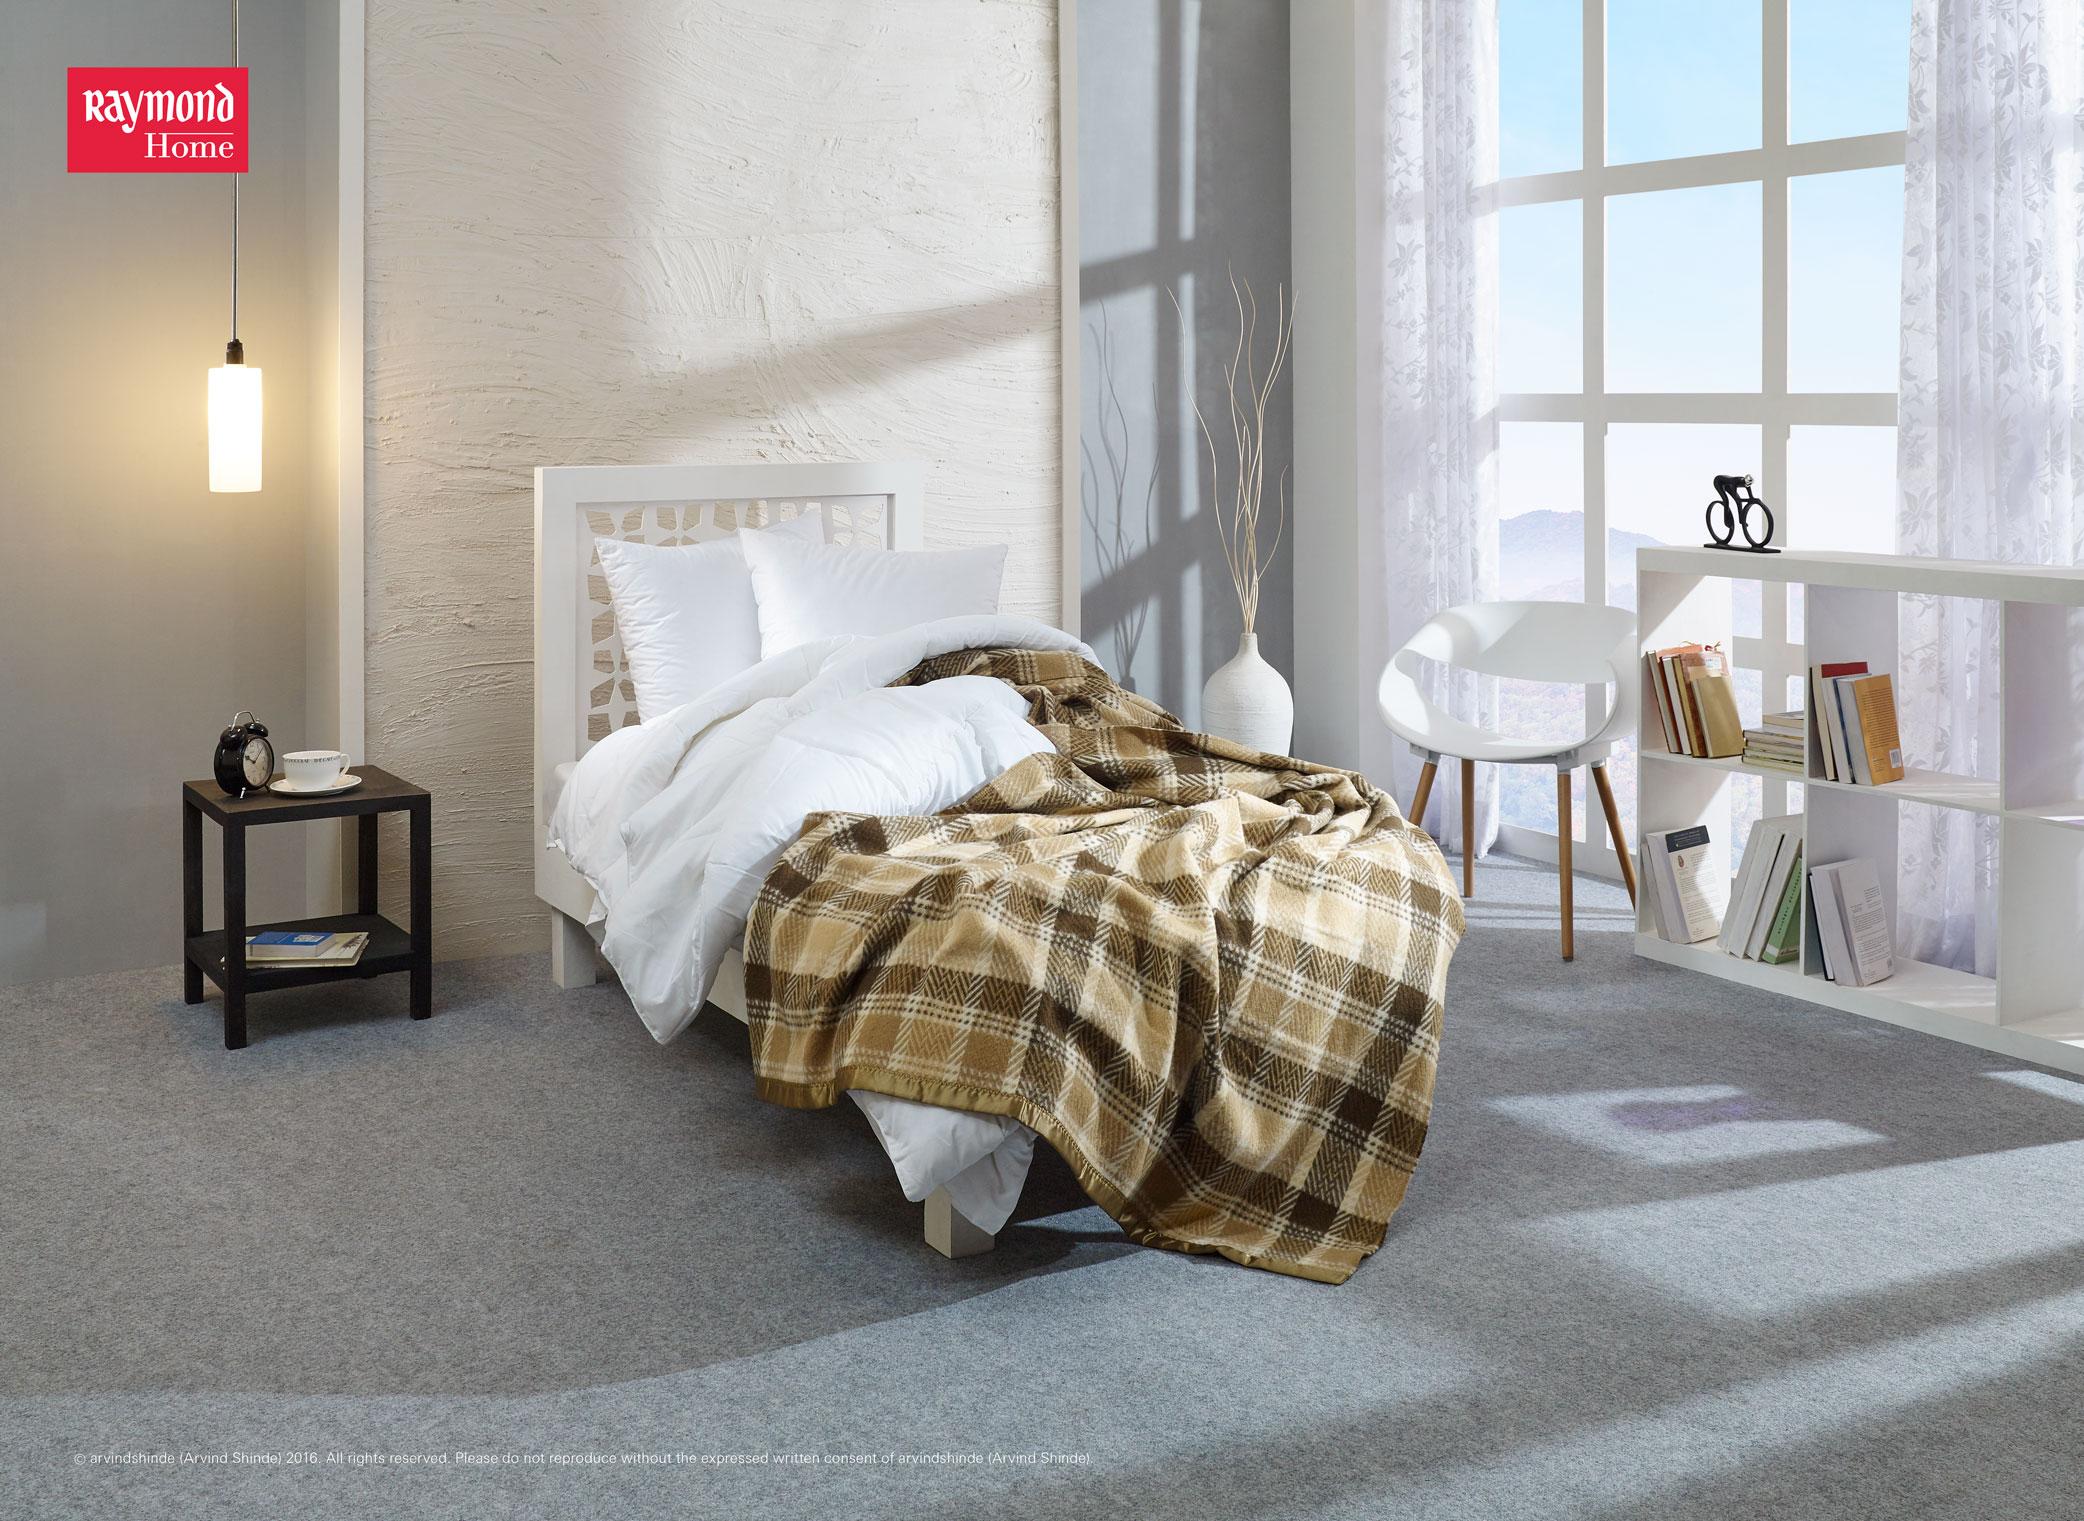 Raymond-home-Blanket-RESONANCE